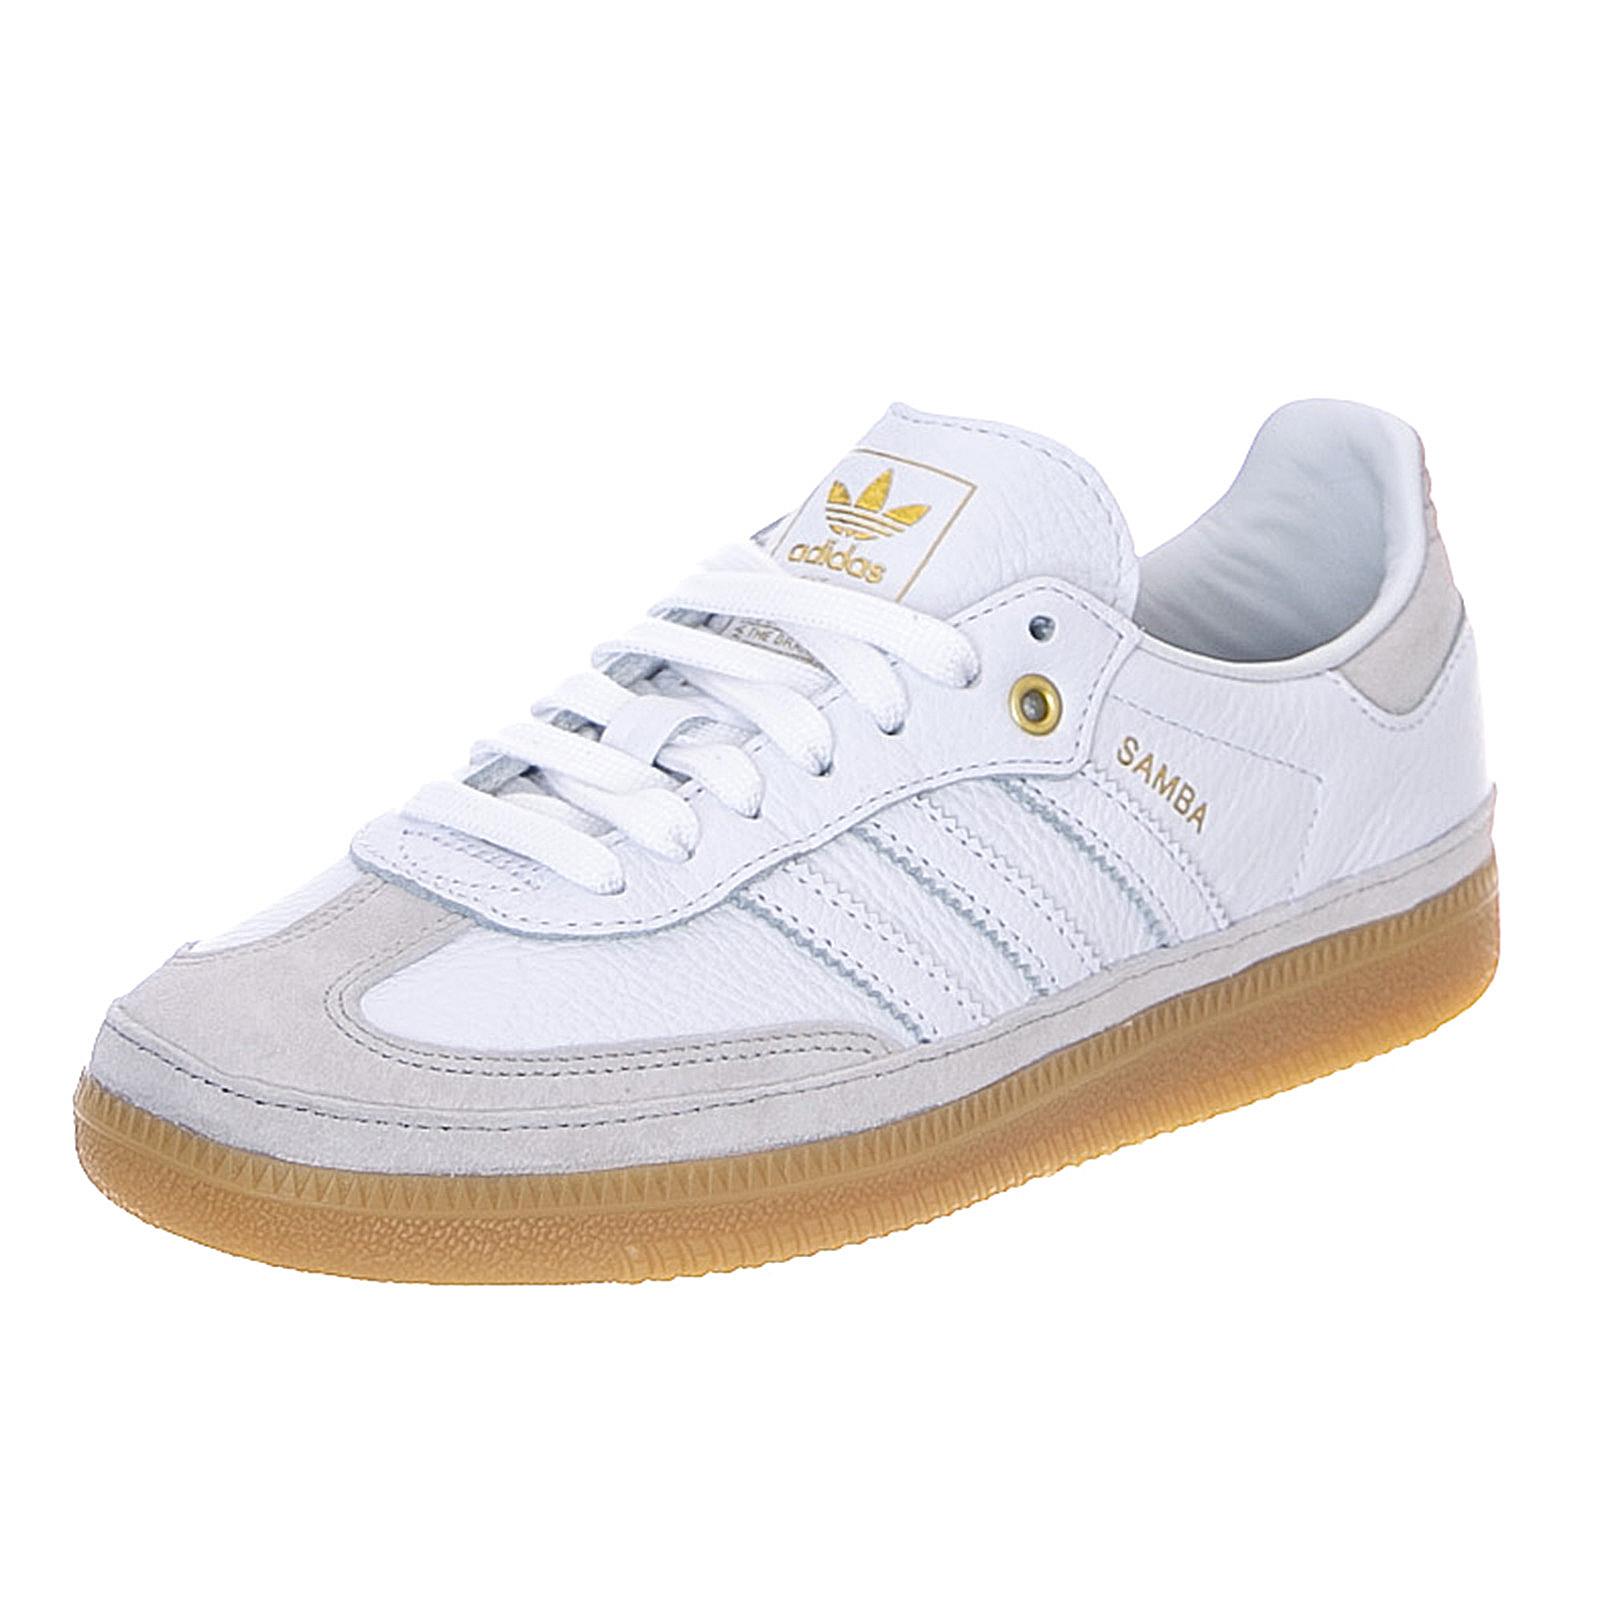 a4c22aba293 Adidas Samba Og W Relay - White - Sneakers Lace-up Man Woman White ...